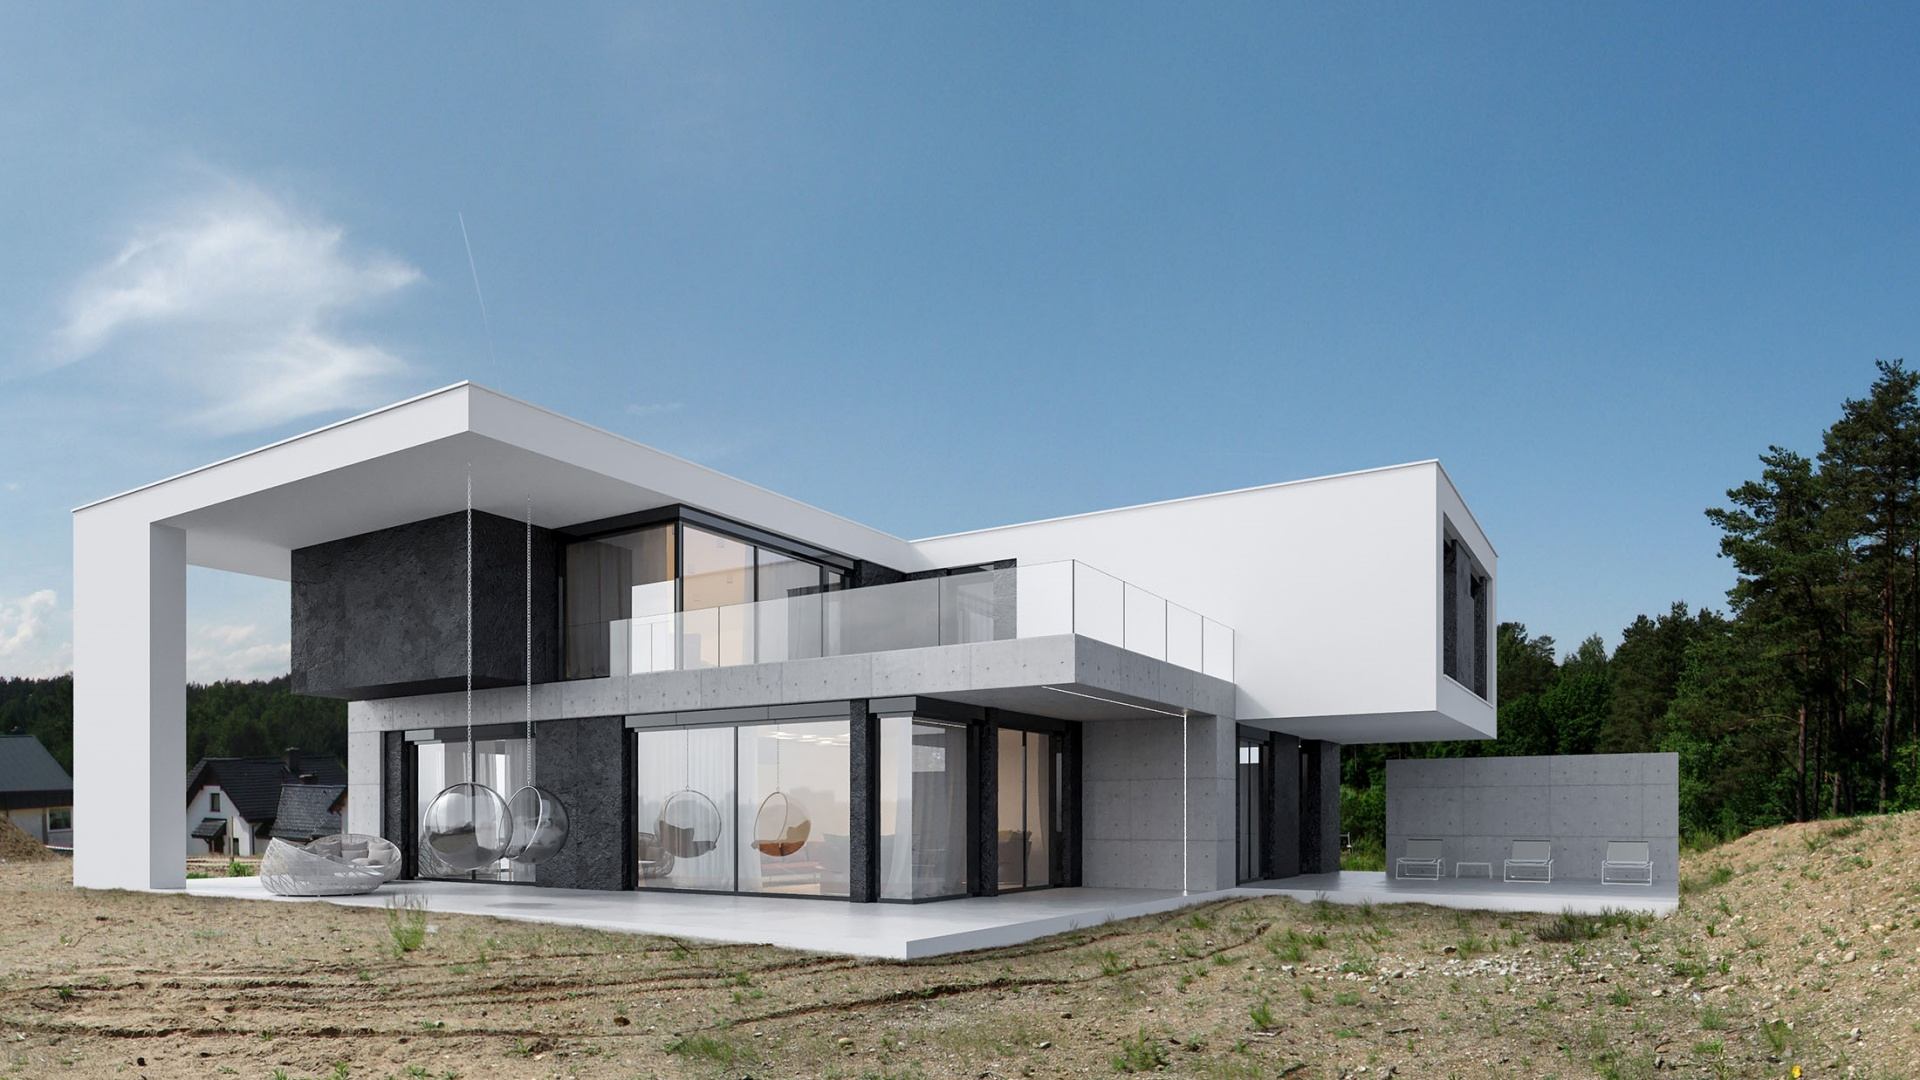 RE: HOUSE ON THE SAND projektu architekta Marcina Tomaszewskiego REFORM Architekt